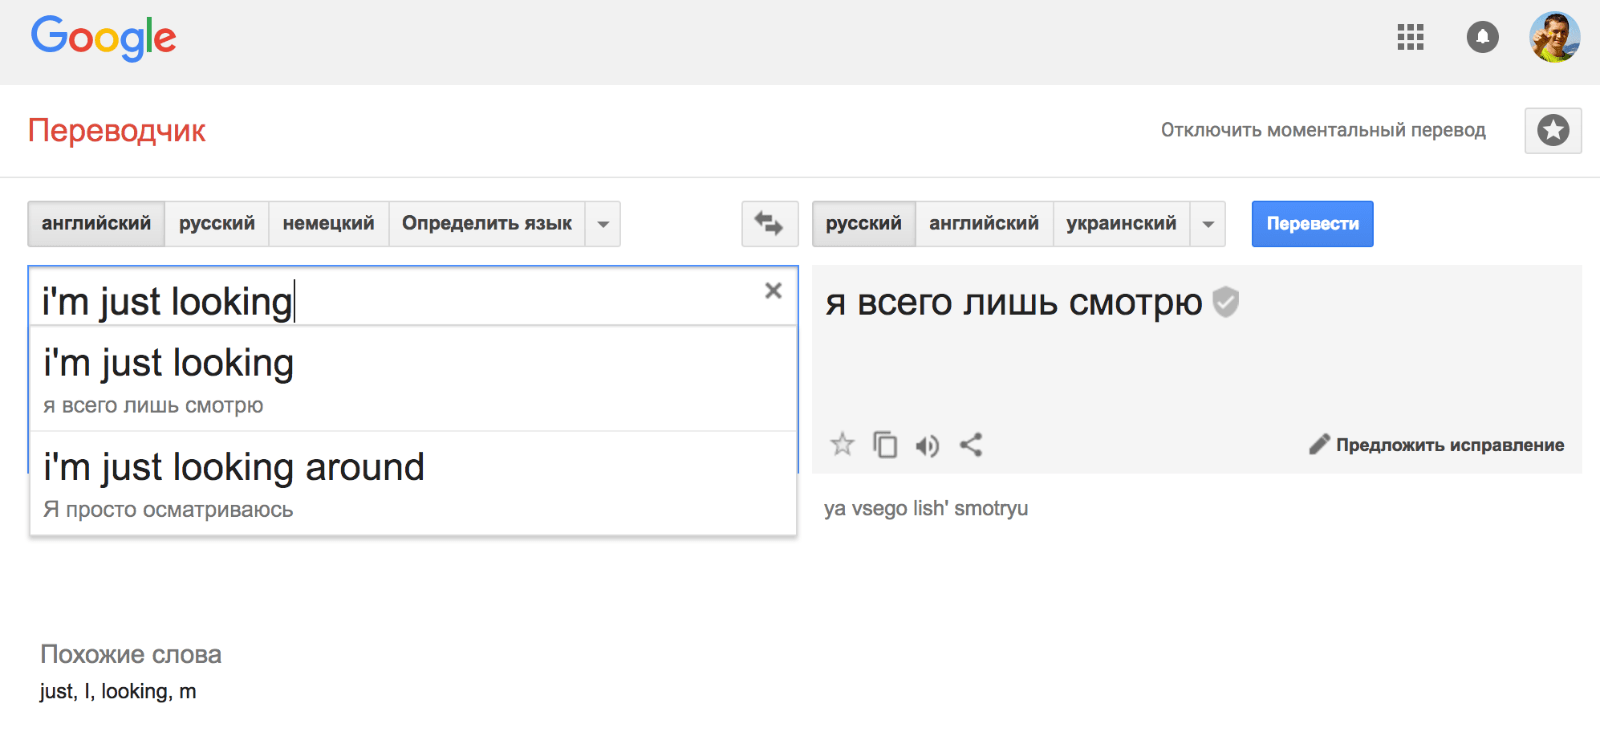 Онлайн перевод картинок с английского на русский